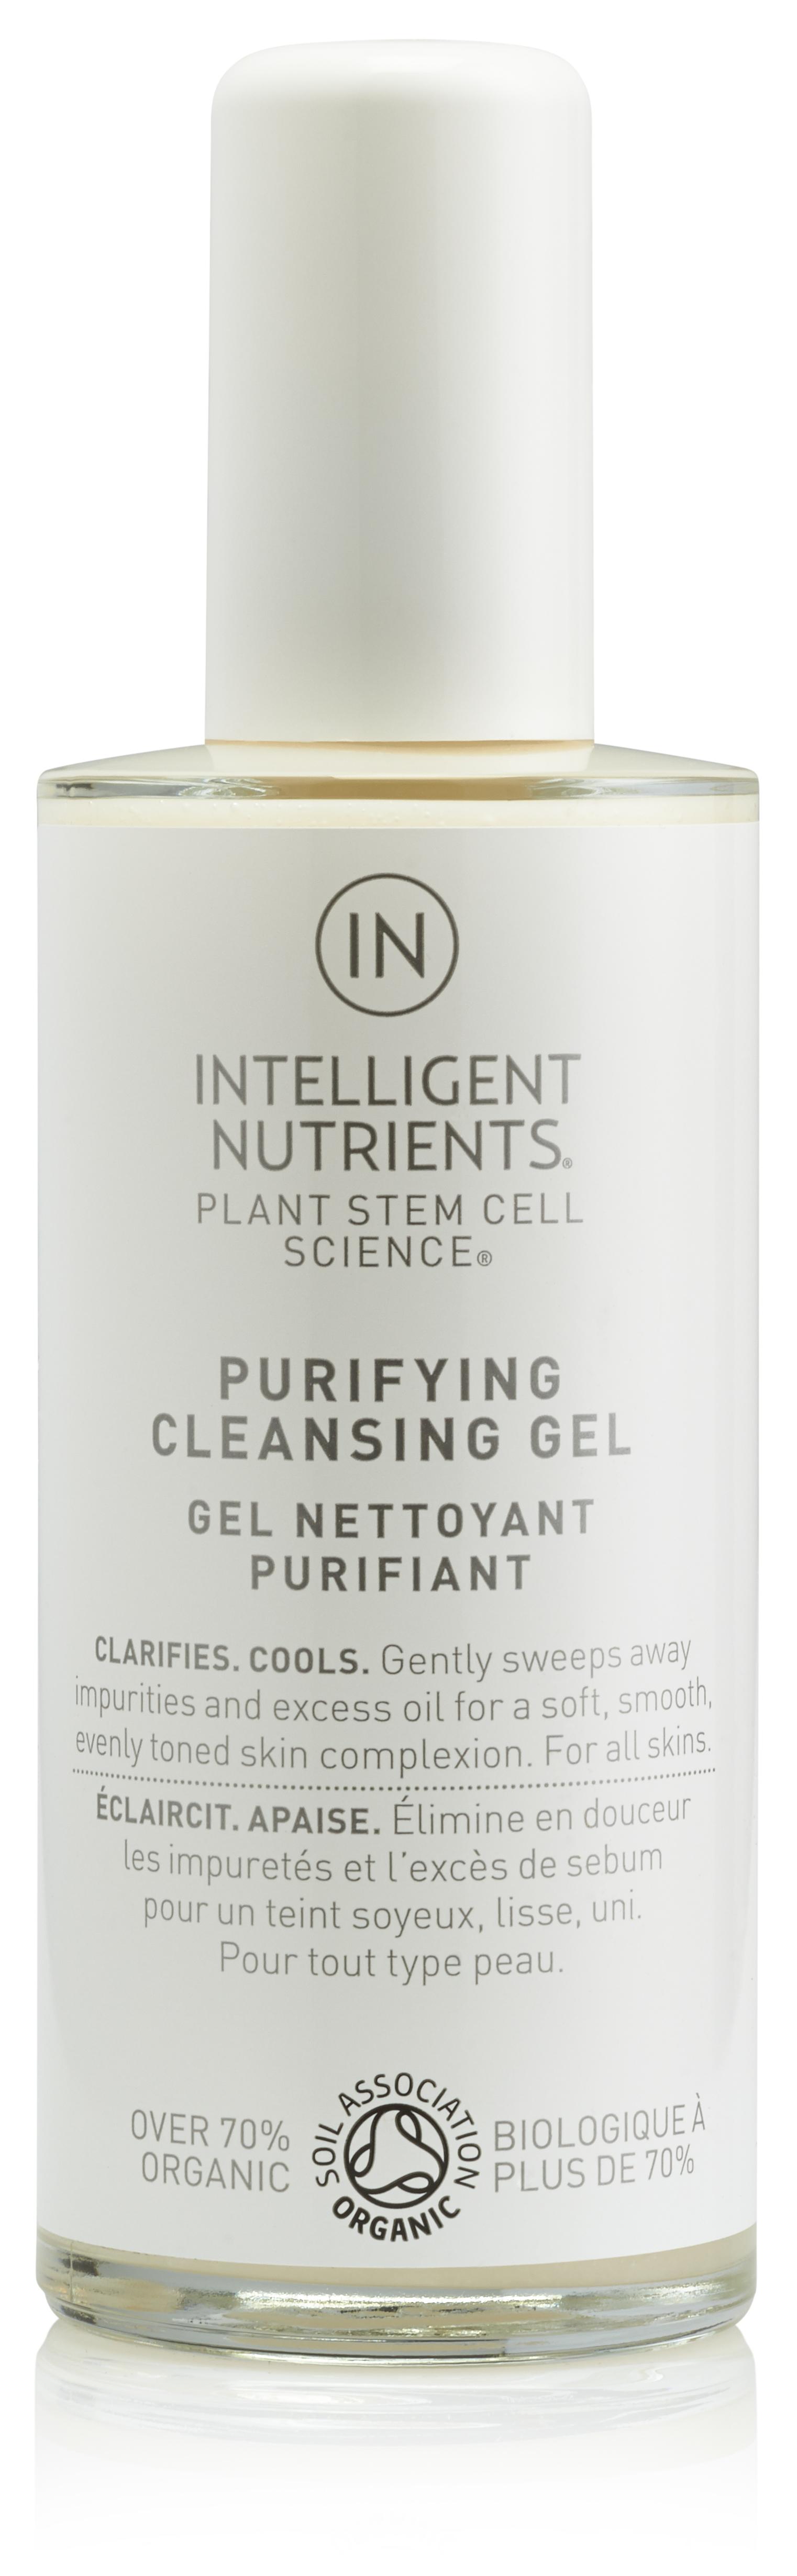 Purifying Cleansing Gel (DKK345/97ml)